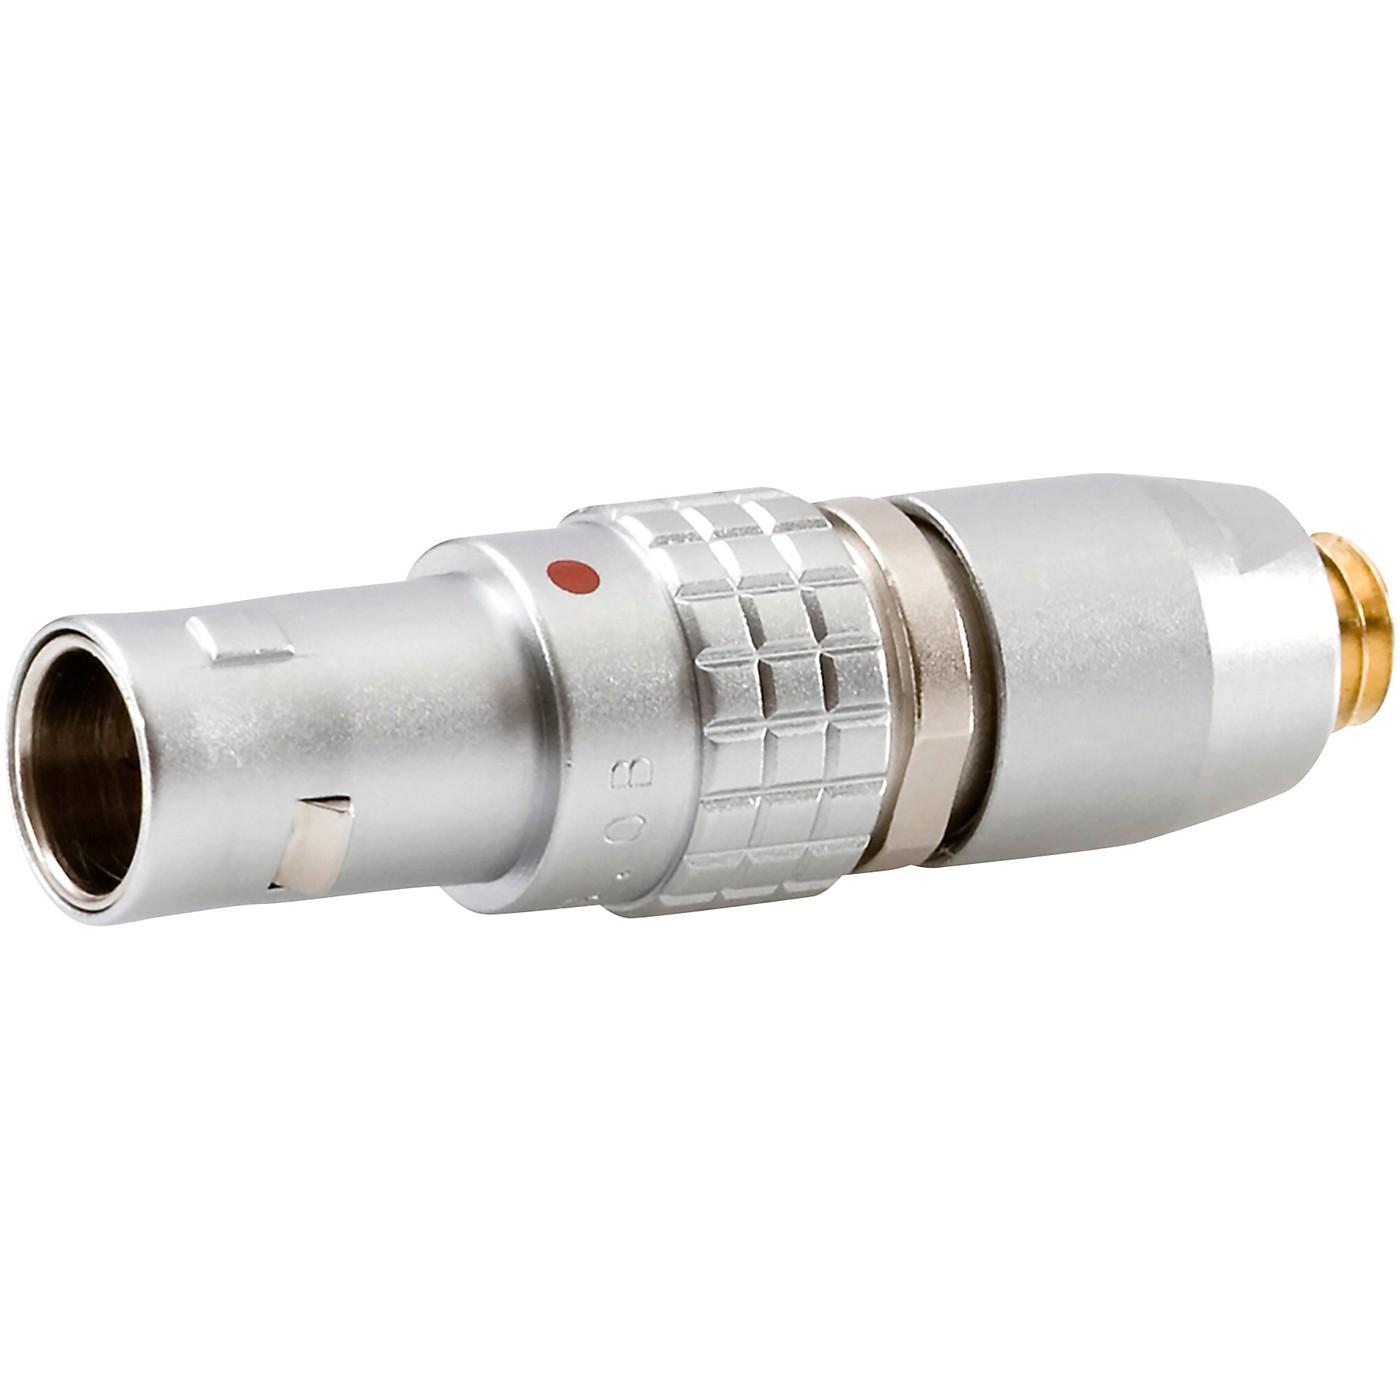 DPA Microphones MicroDot Adapter For Audio Ltd. En2 MiniTX Wireless Systems (DAD6035) thumbnail